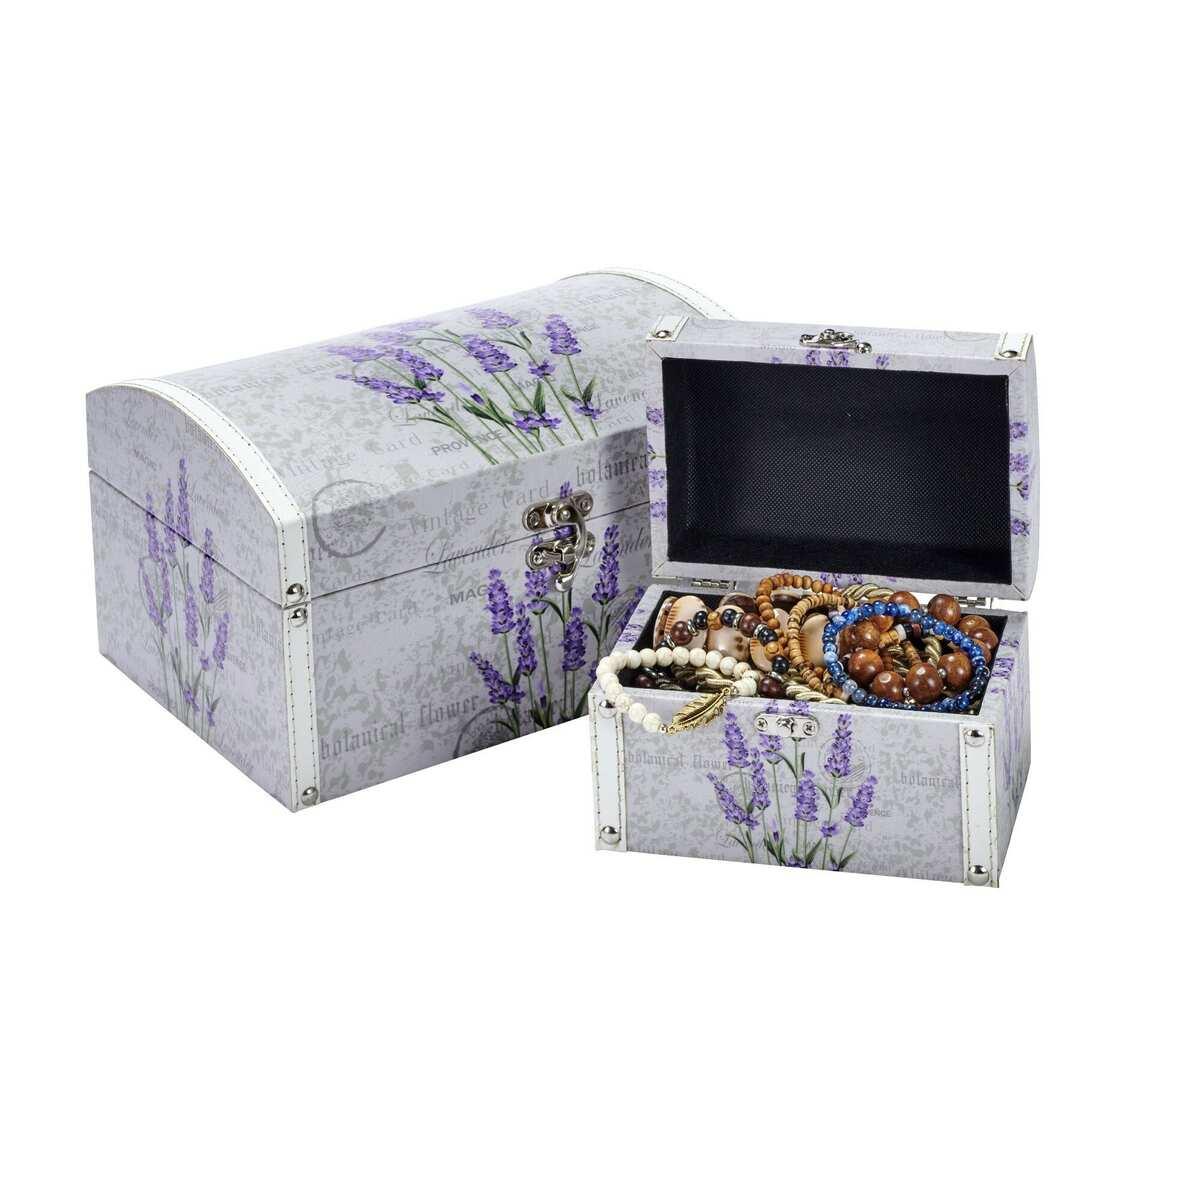 Bild 3 von Deko-Box in tollem Lavendel-Design